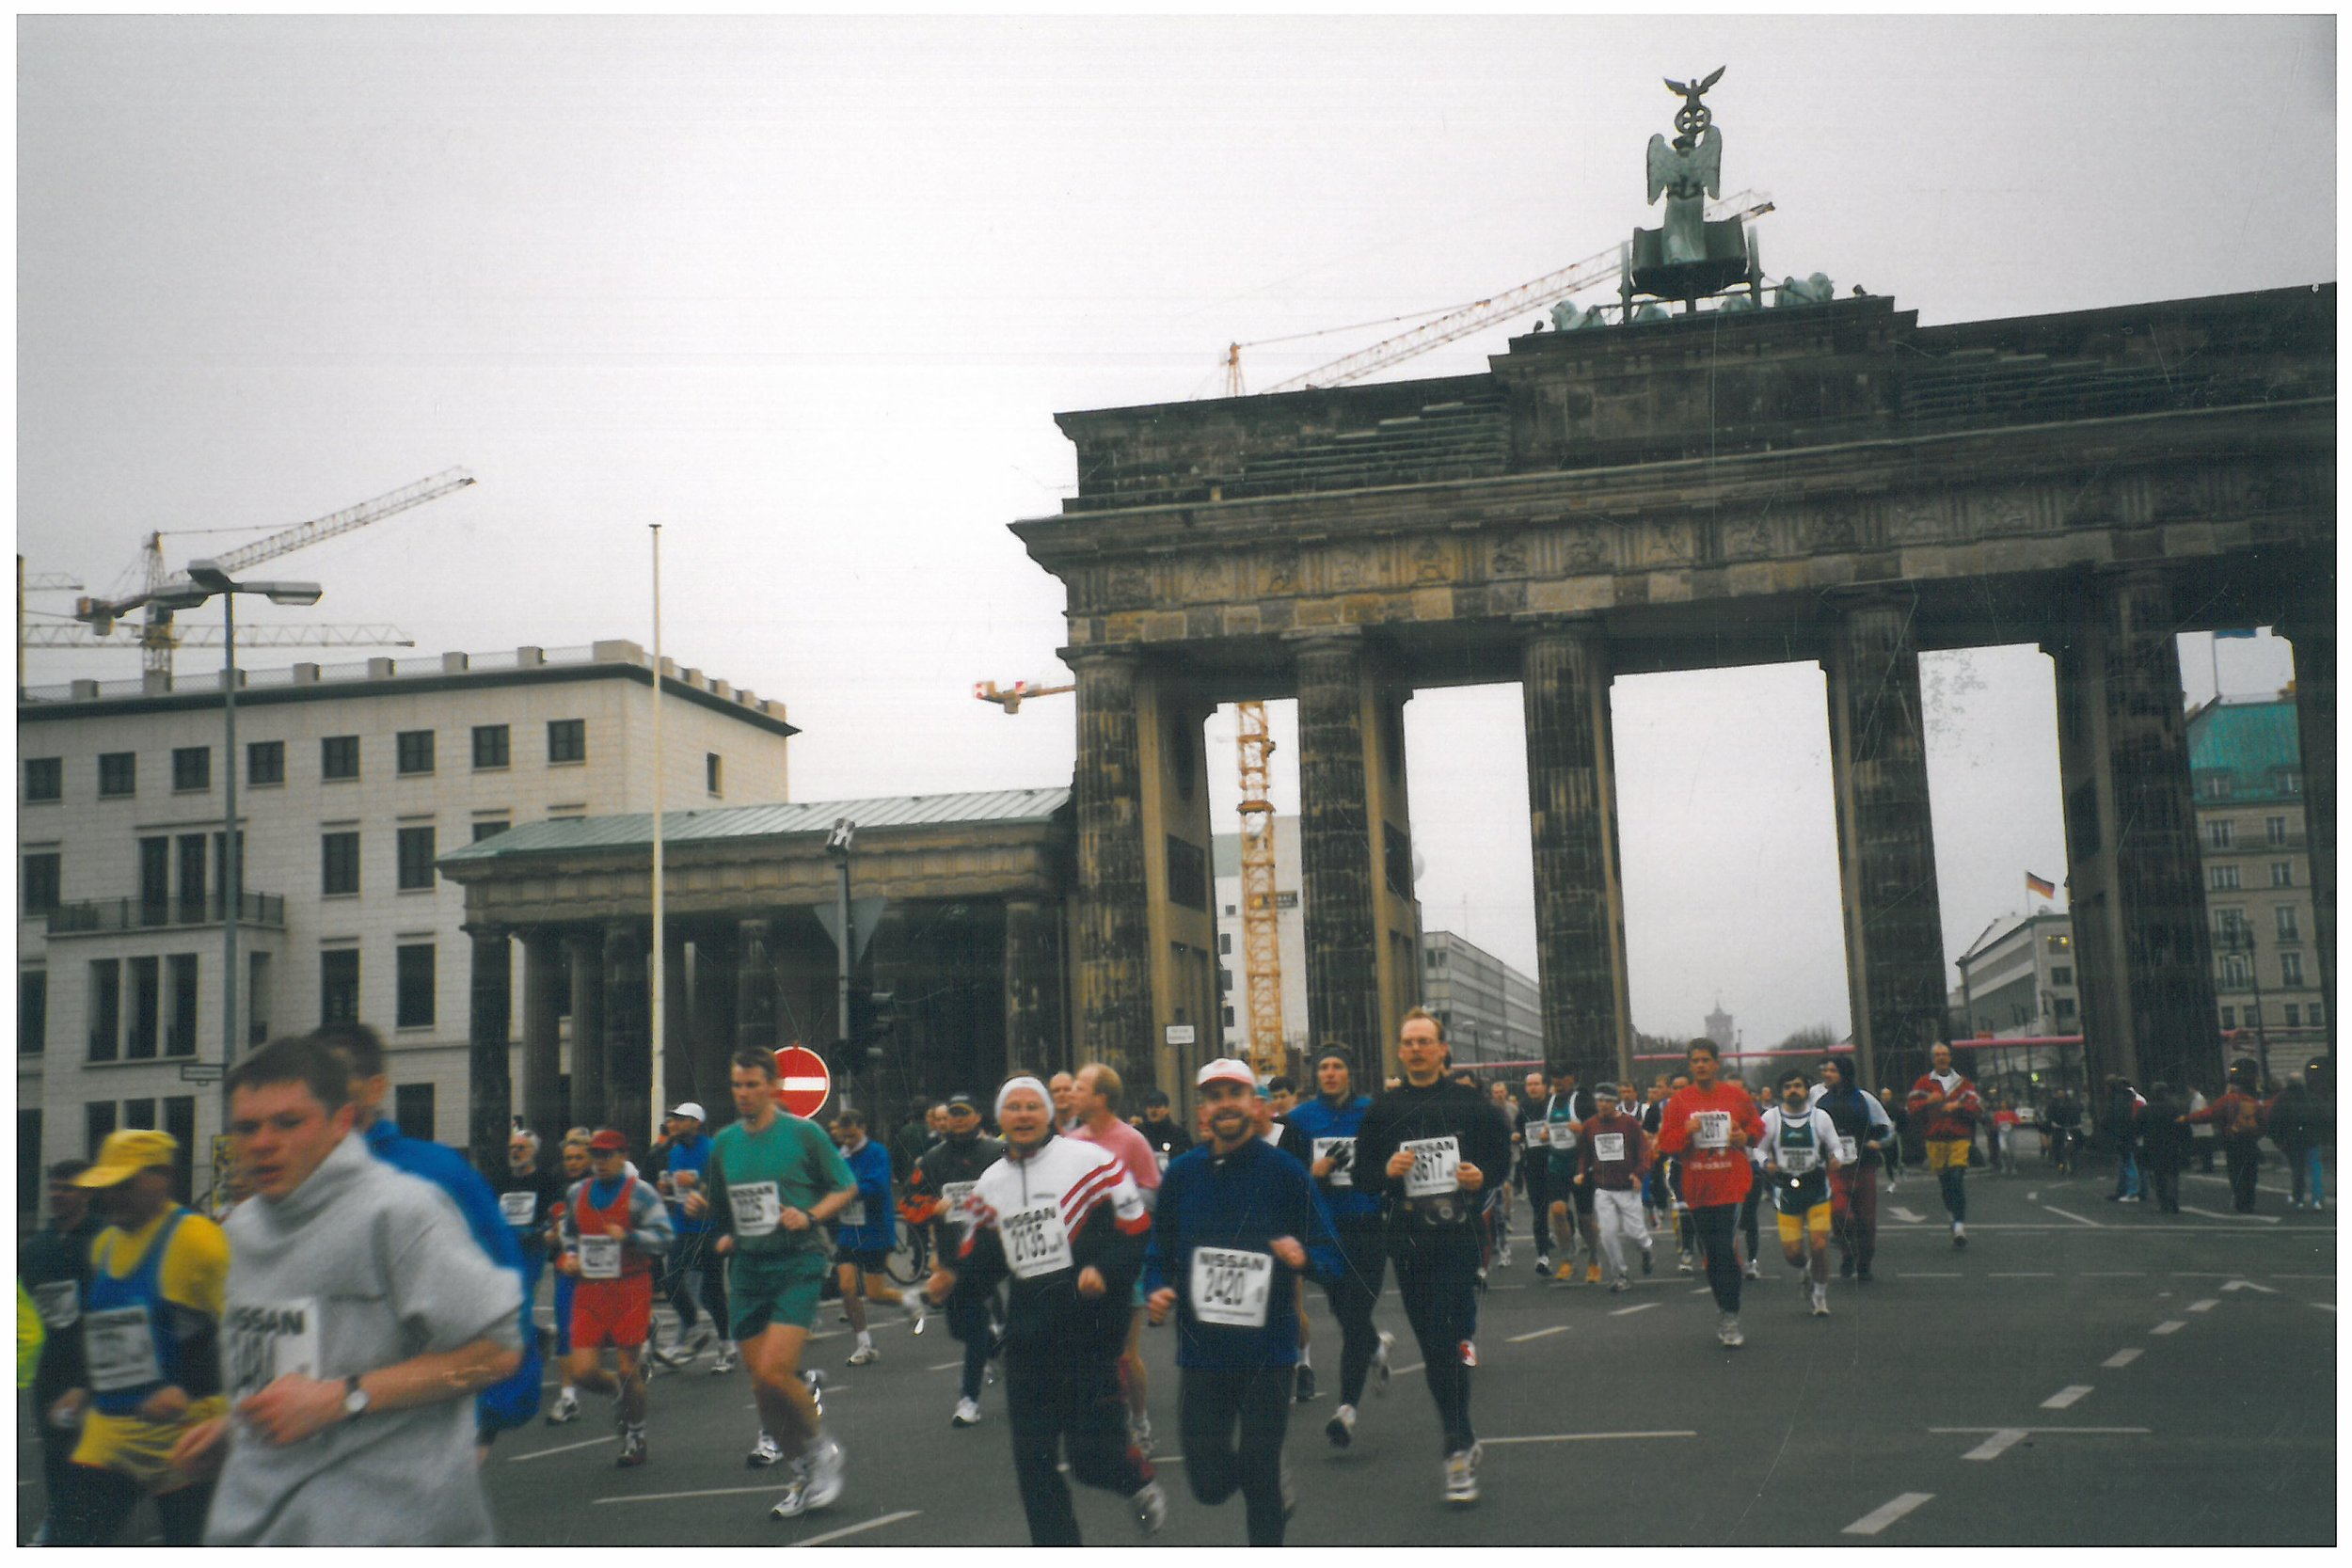 1999 Running through the Brandenburger Gate in Berlin